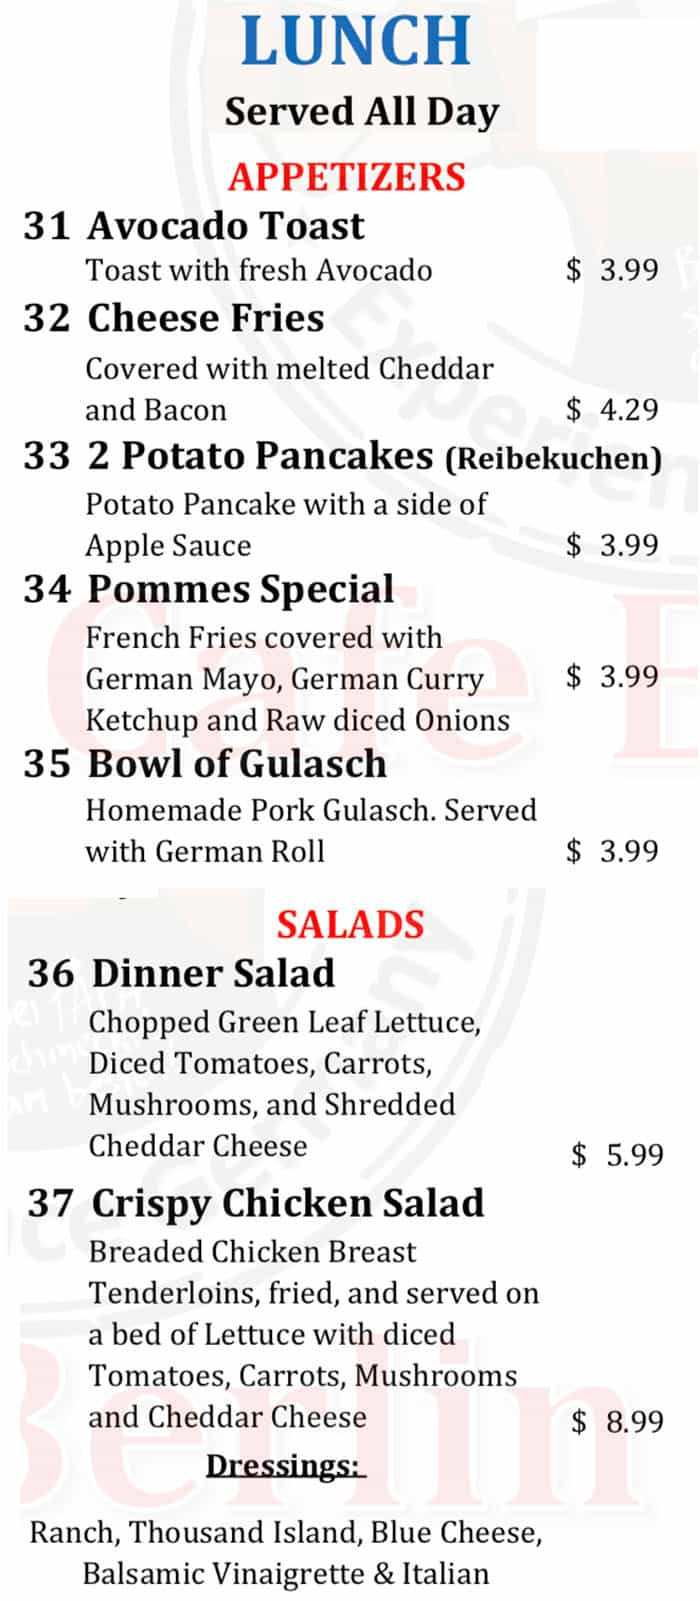 Cafe Berlin lunch menu - appetizers, salads